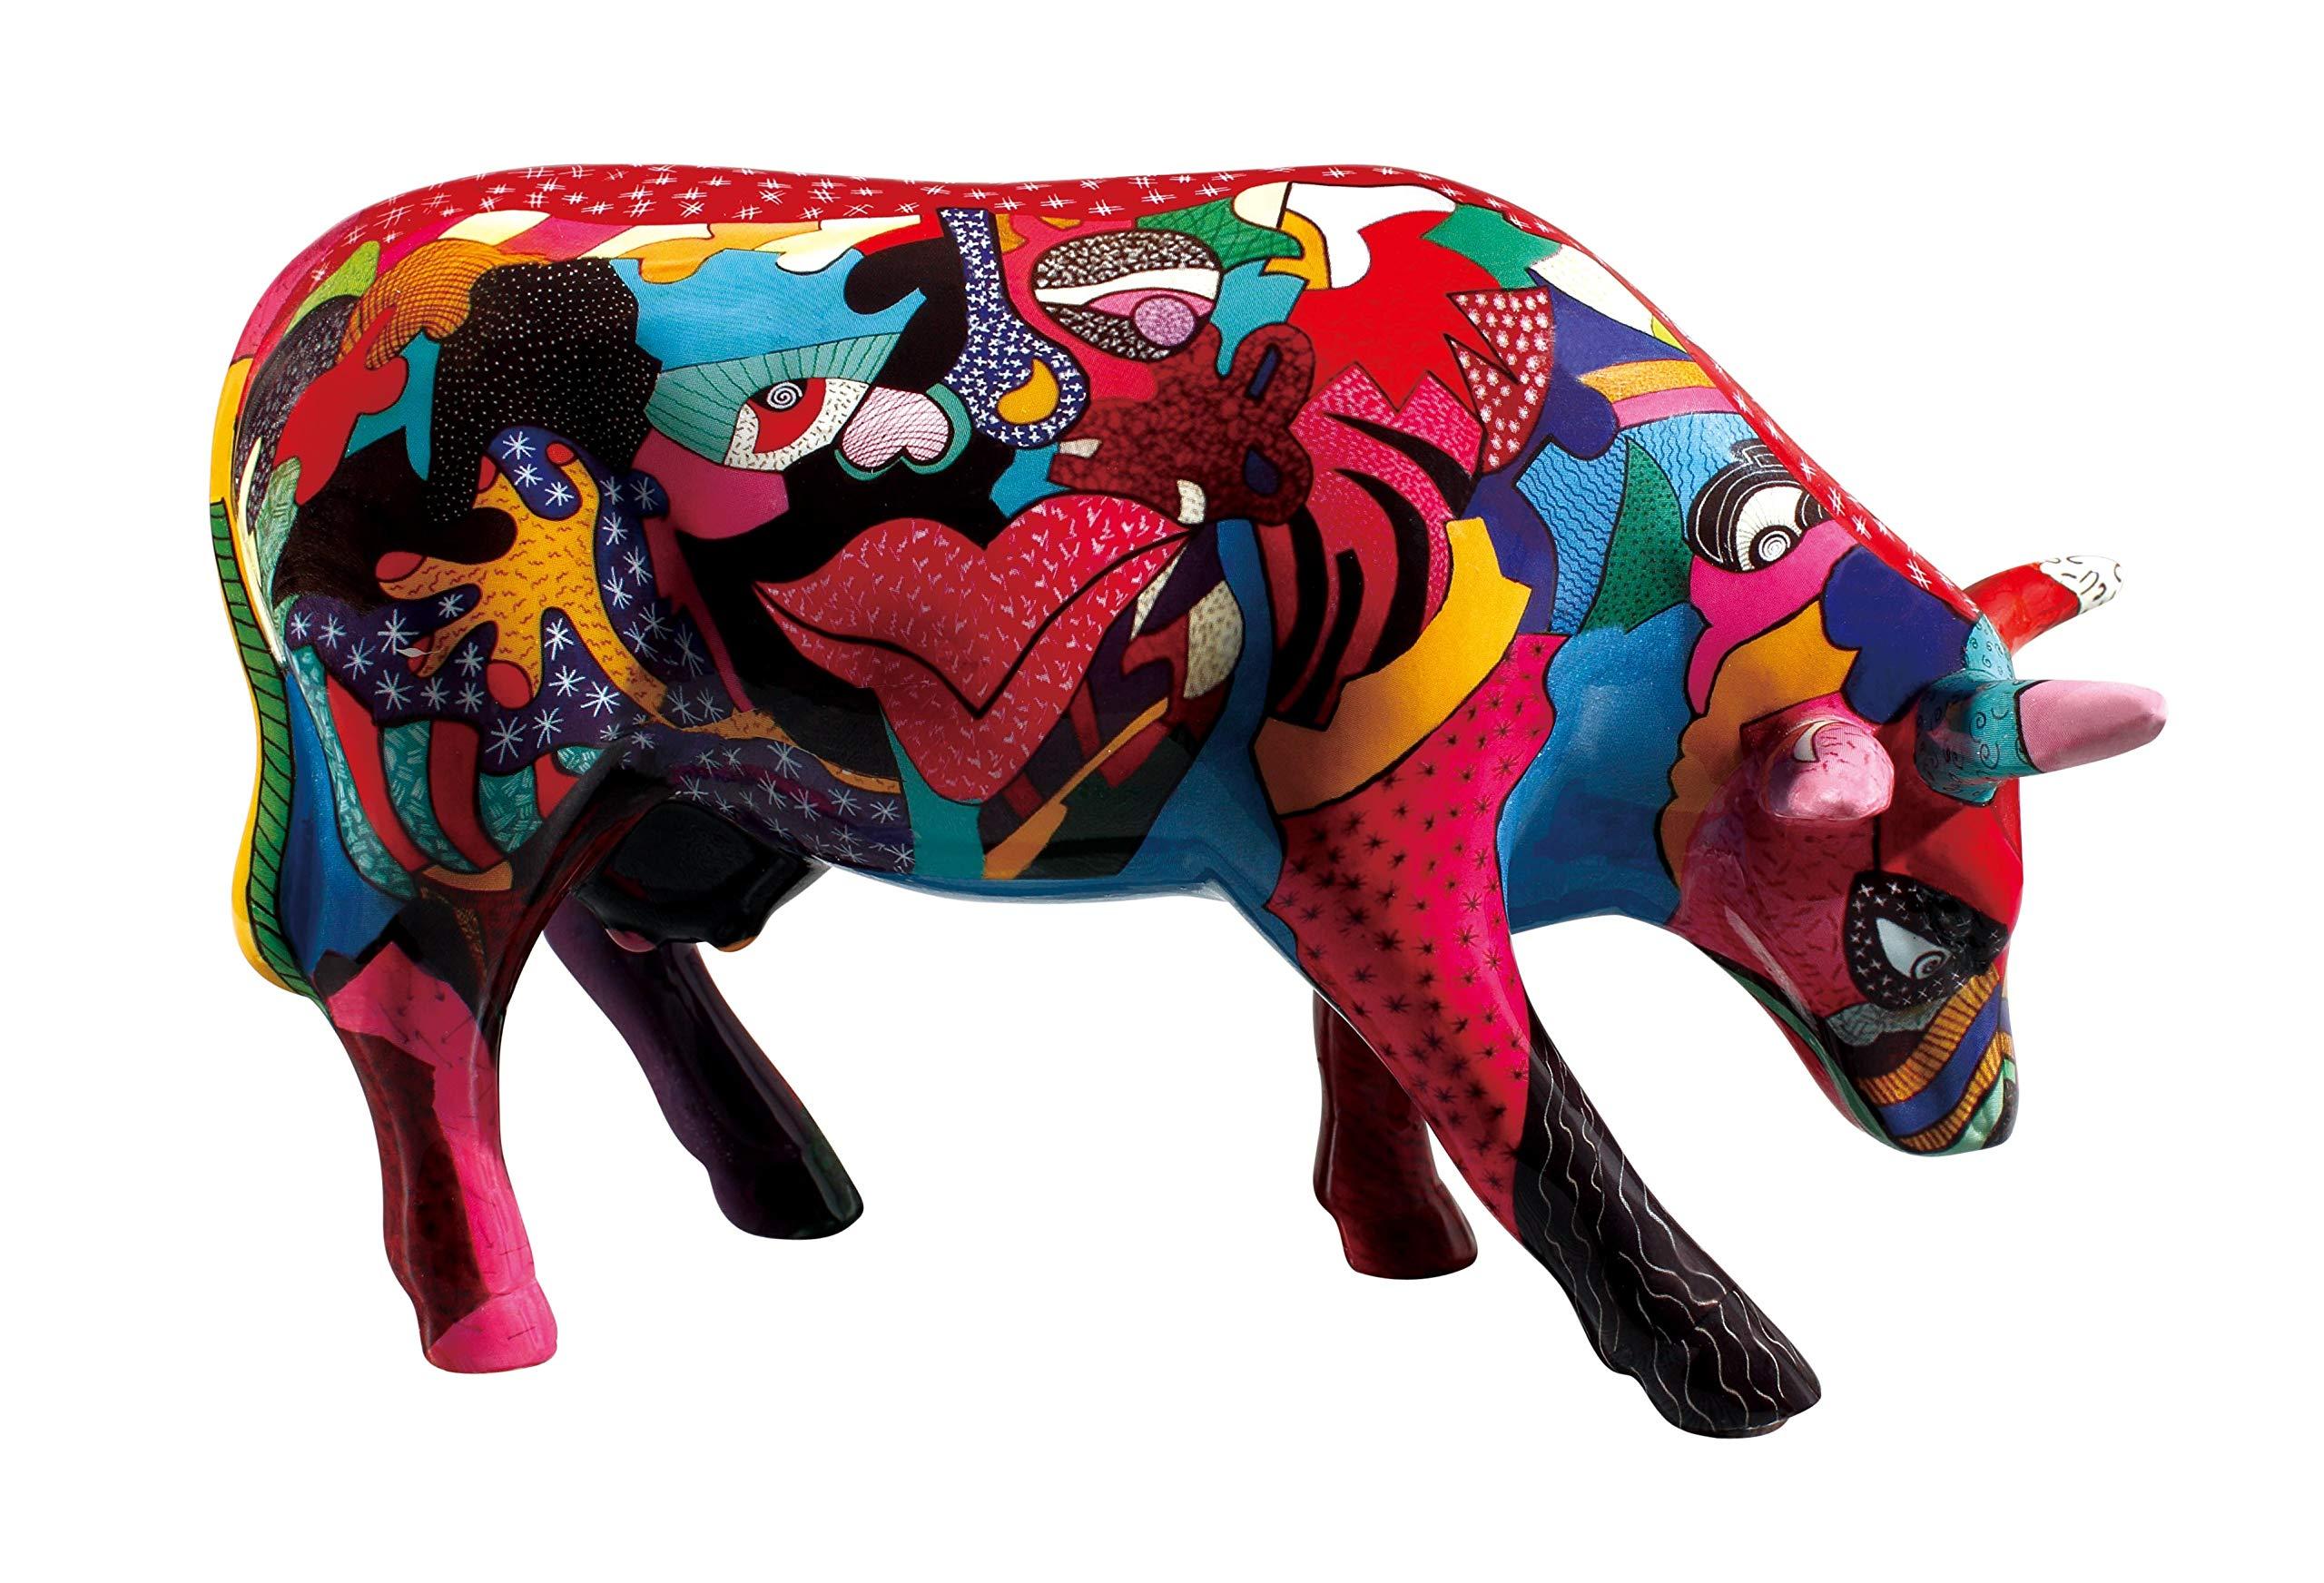 Cowparade Cow - Partying wiht Picowsso (M) - Ceramic, 16,5x11cm - Cowparade Kuh #47423